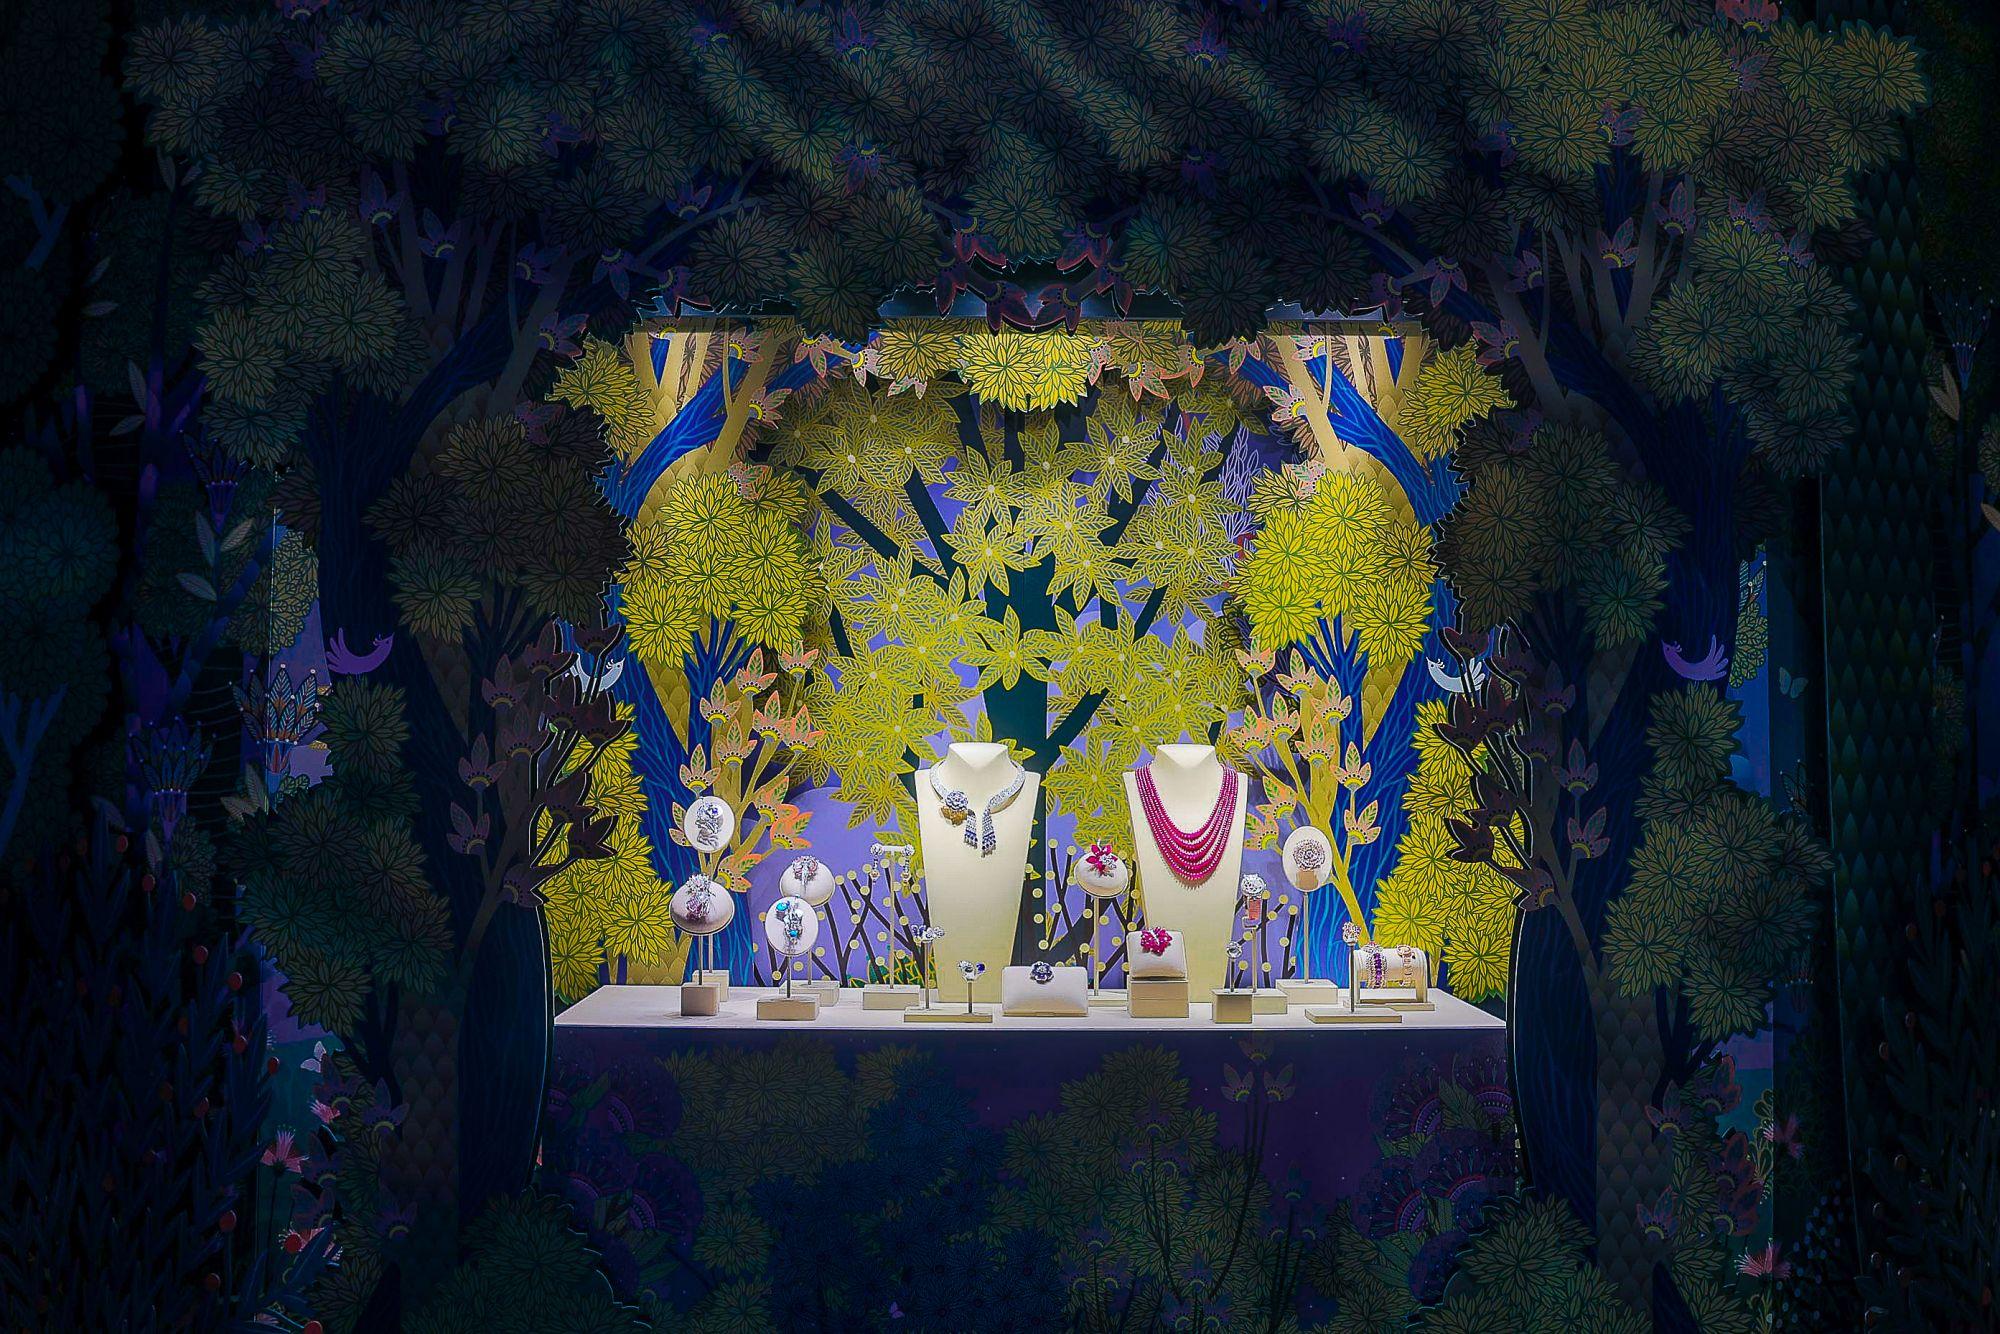 Signature高級珠寶系列活動現場,特別與插畫家Charlotte Gastaut合作的月光森林場景。